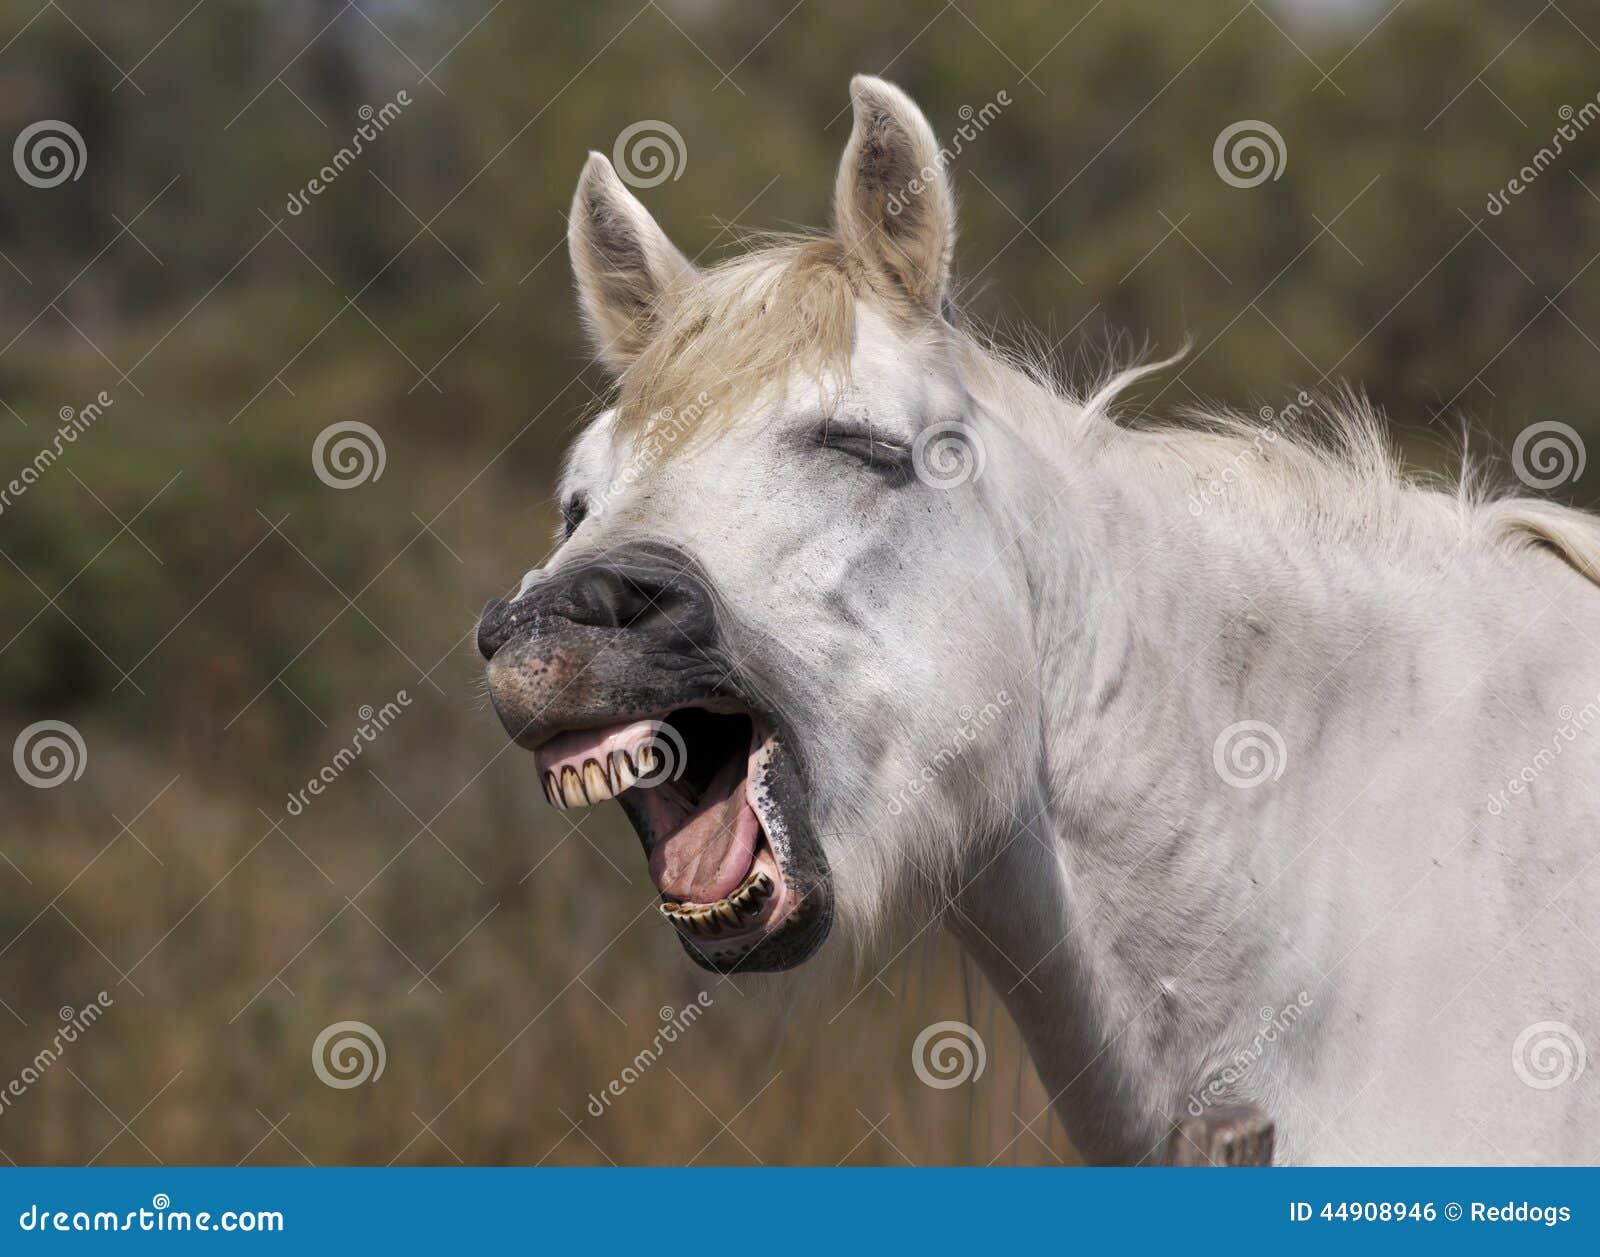 united states horse racing